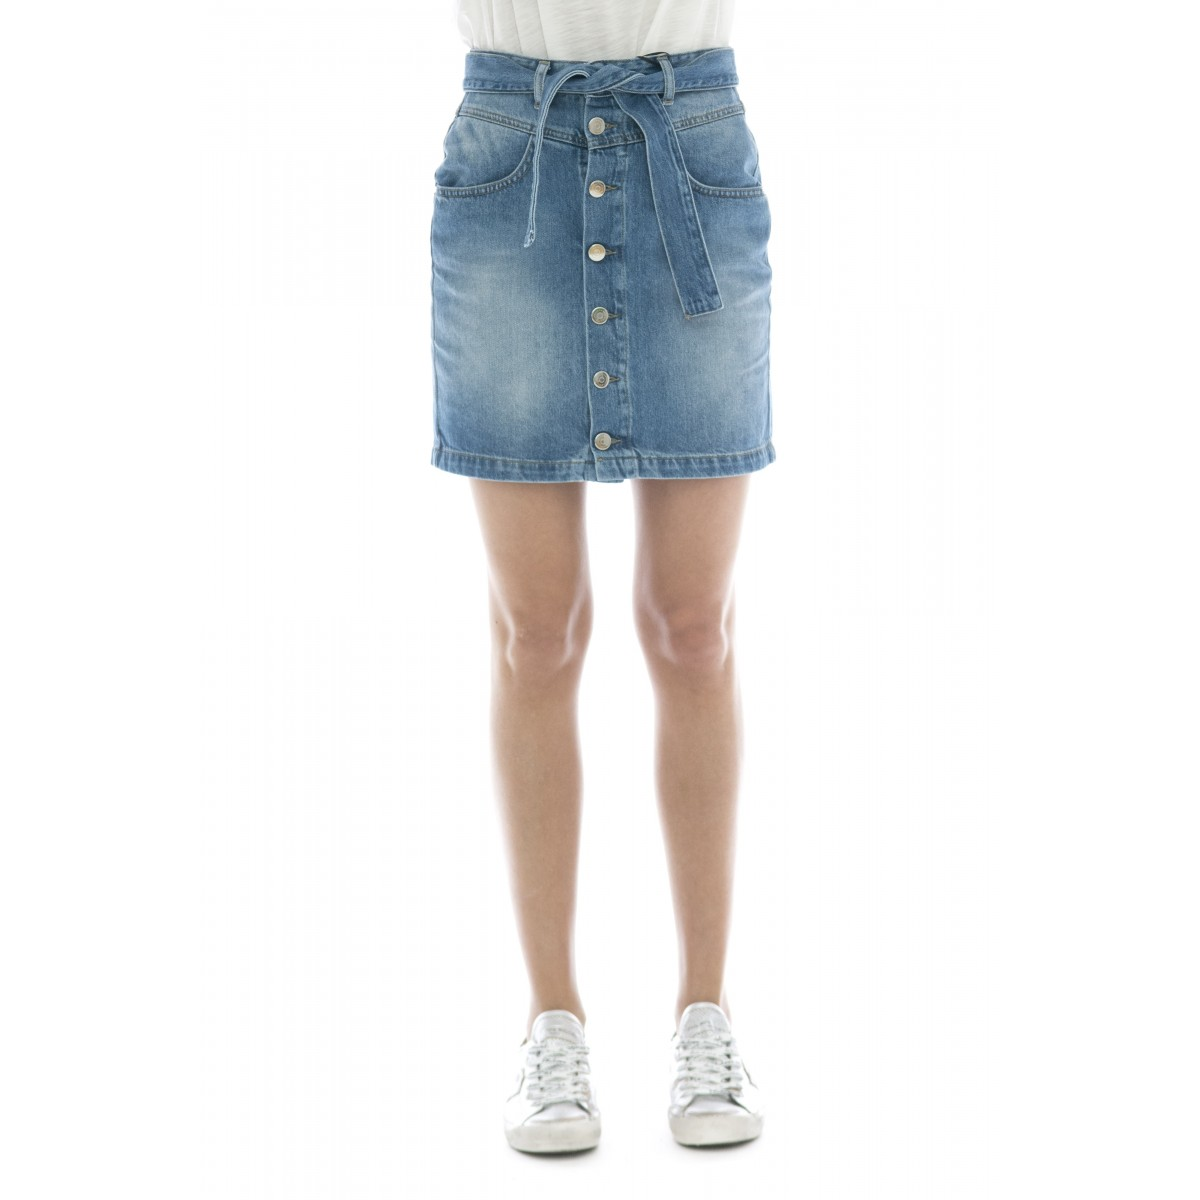 Gonna - Okai gonna jeans